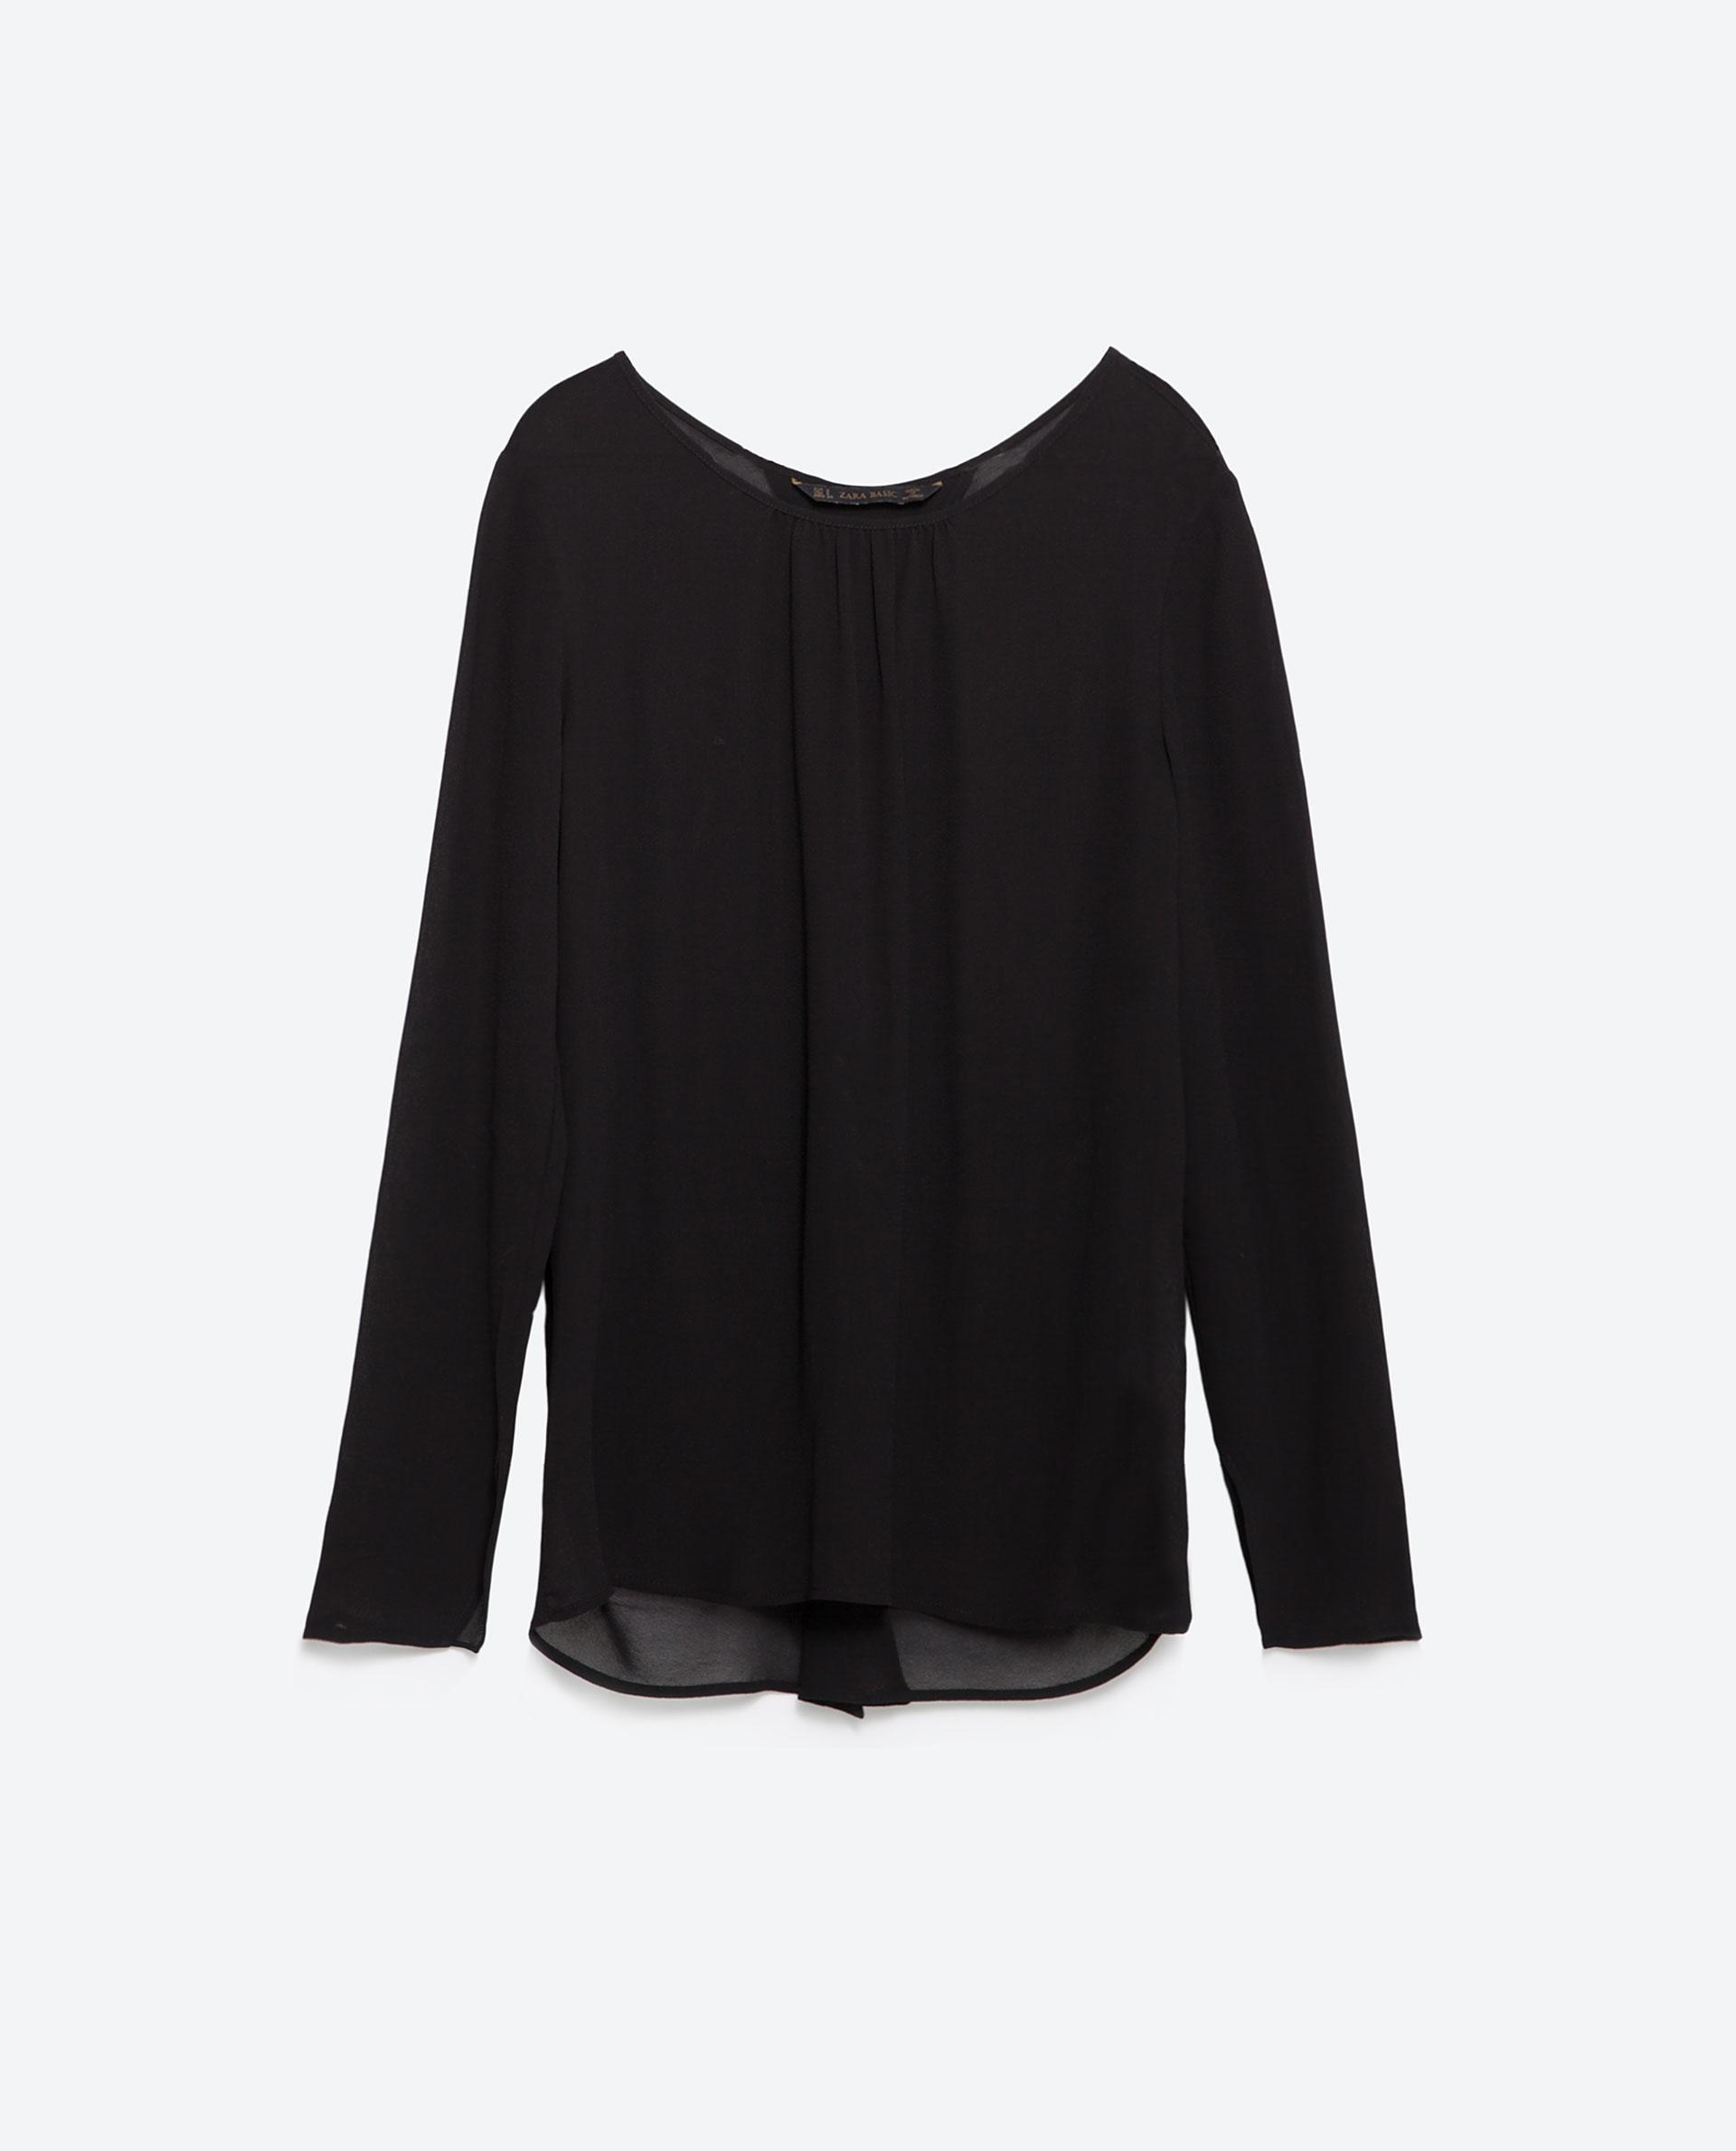 Zara Backless Blouse 78